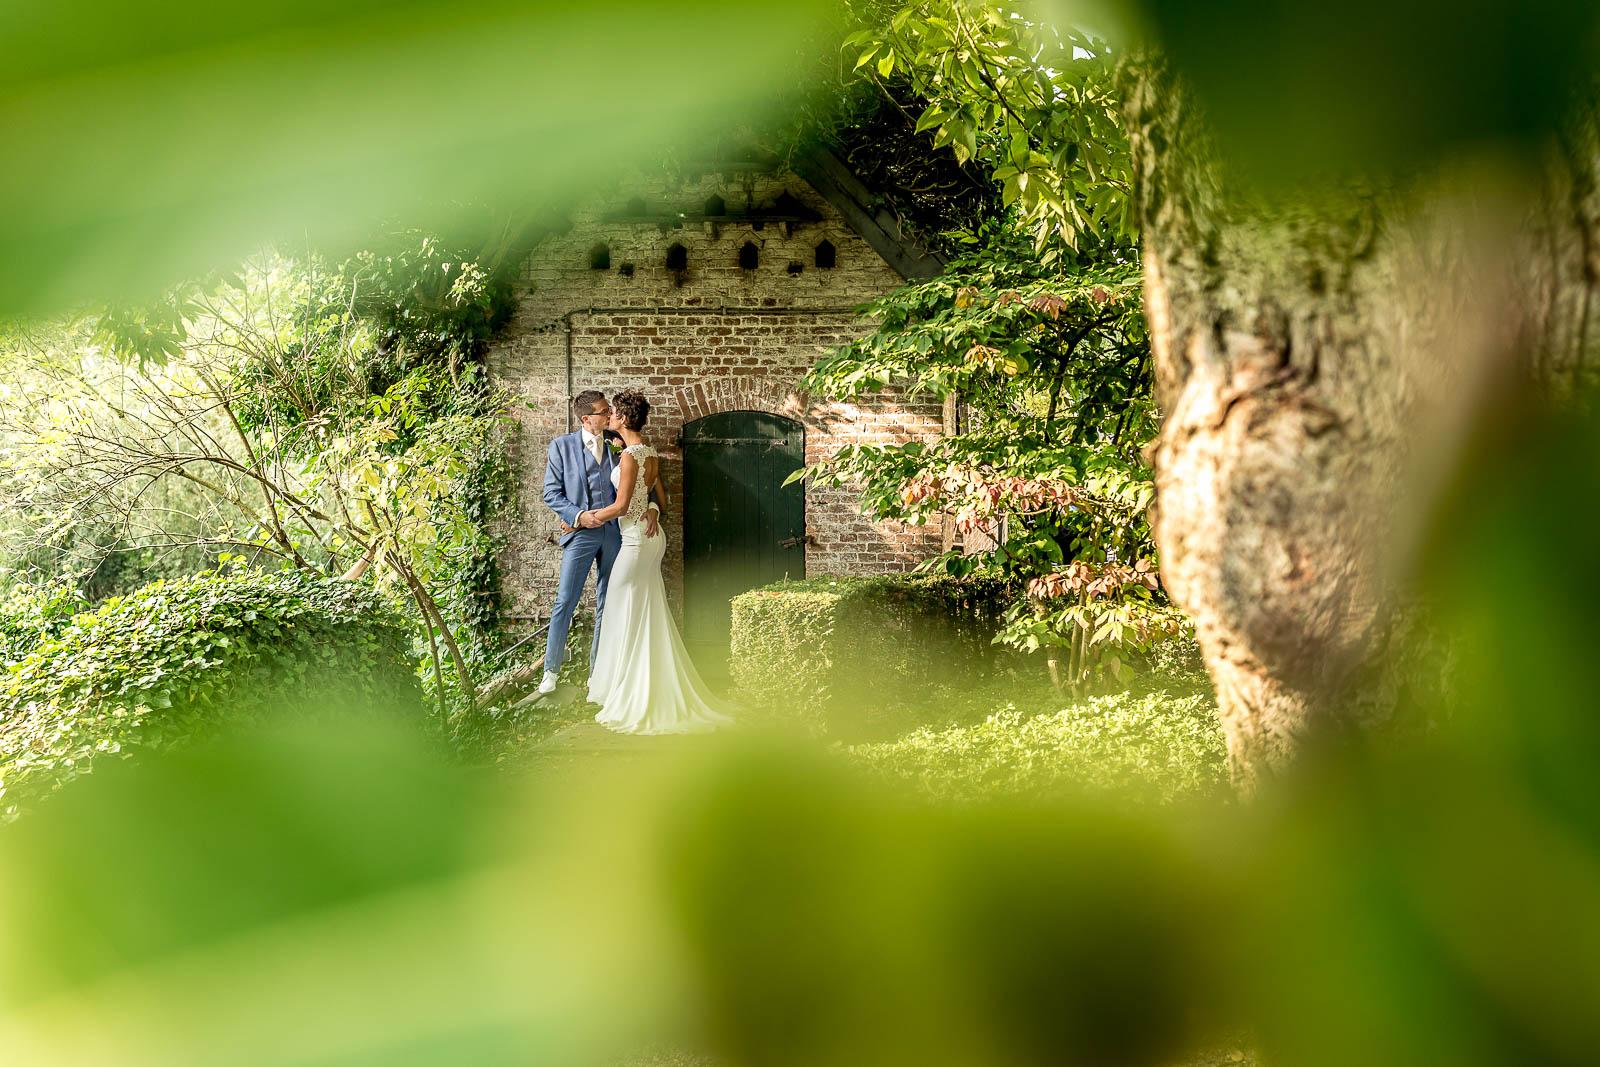 Bruidsfotografie Slot Doddendael   Martijn & Judith